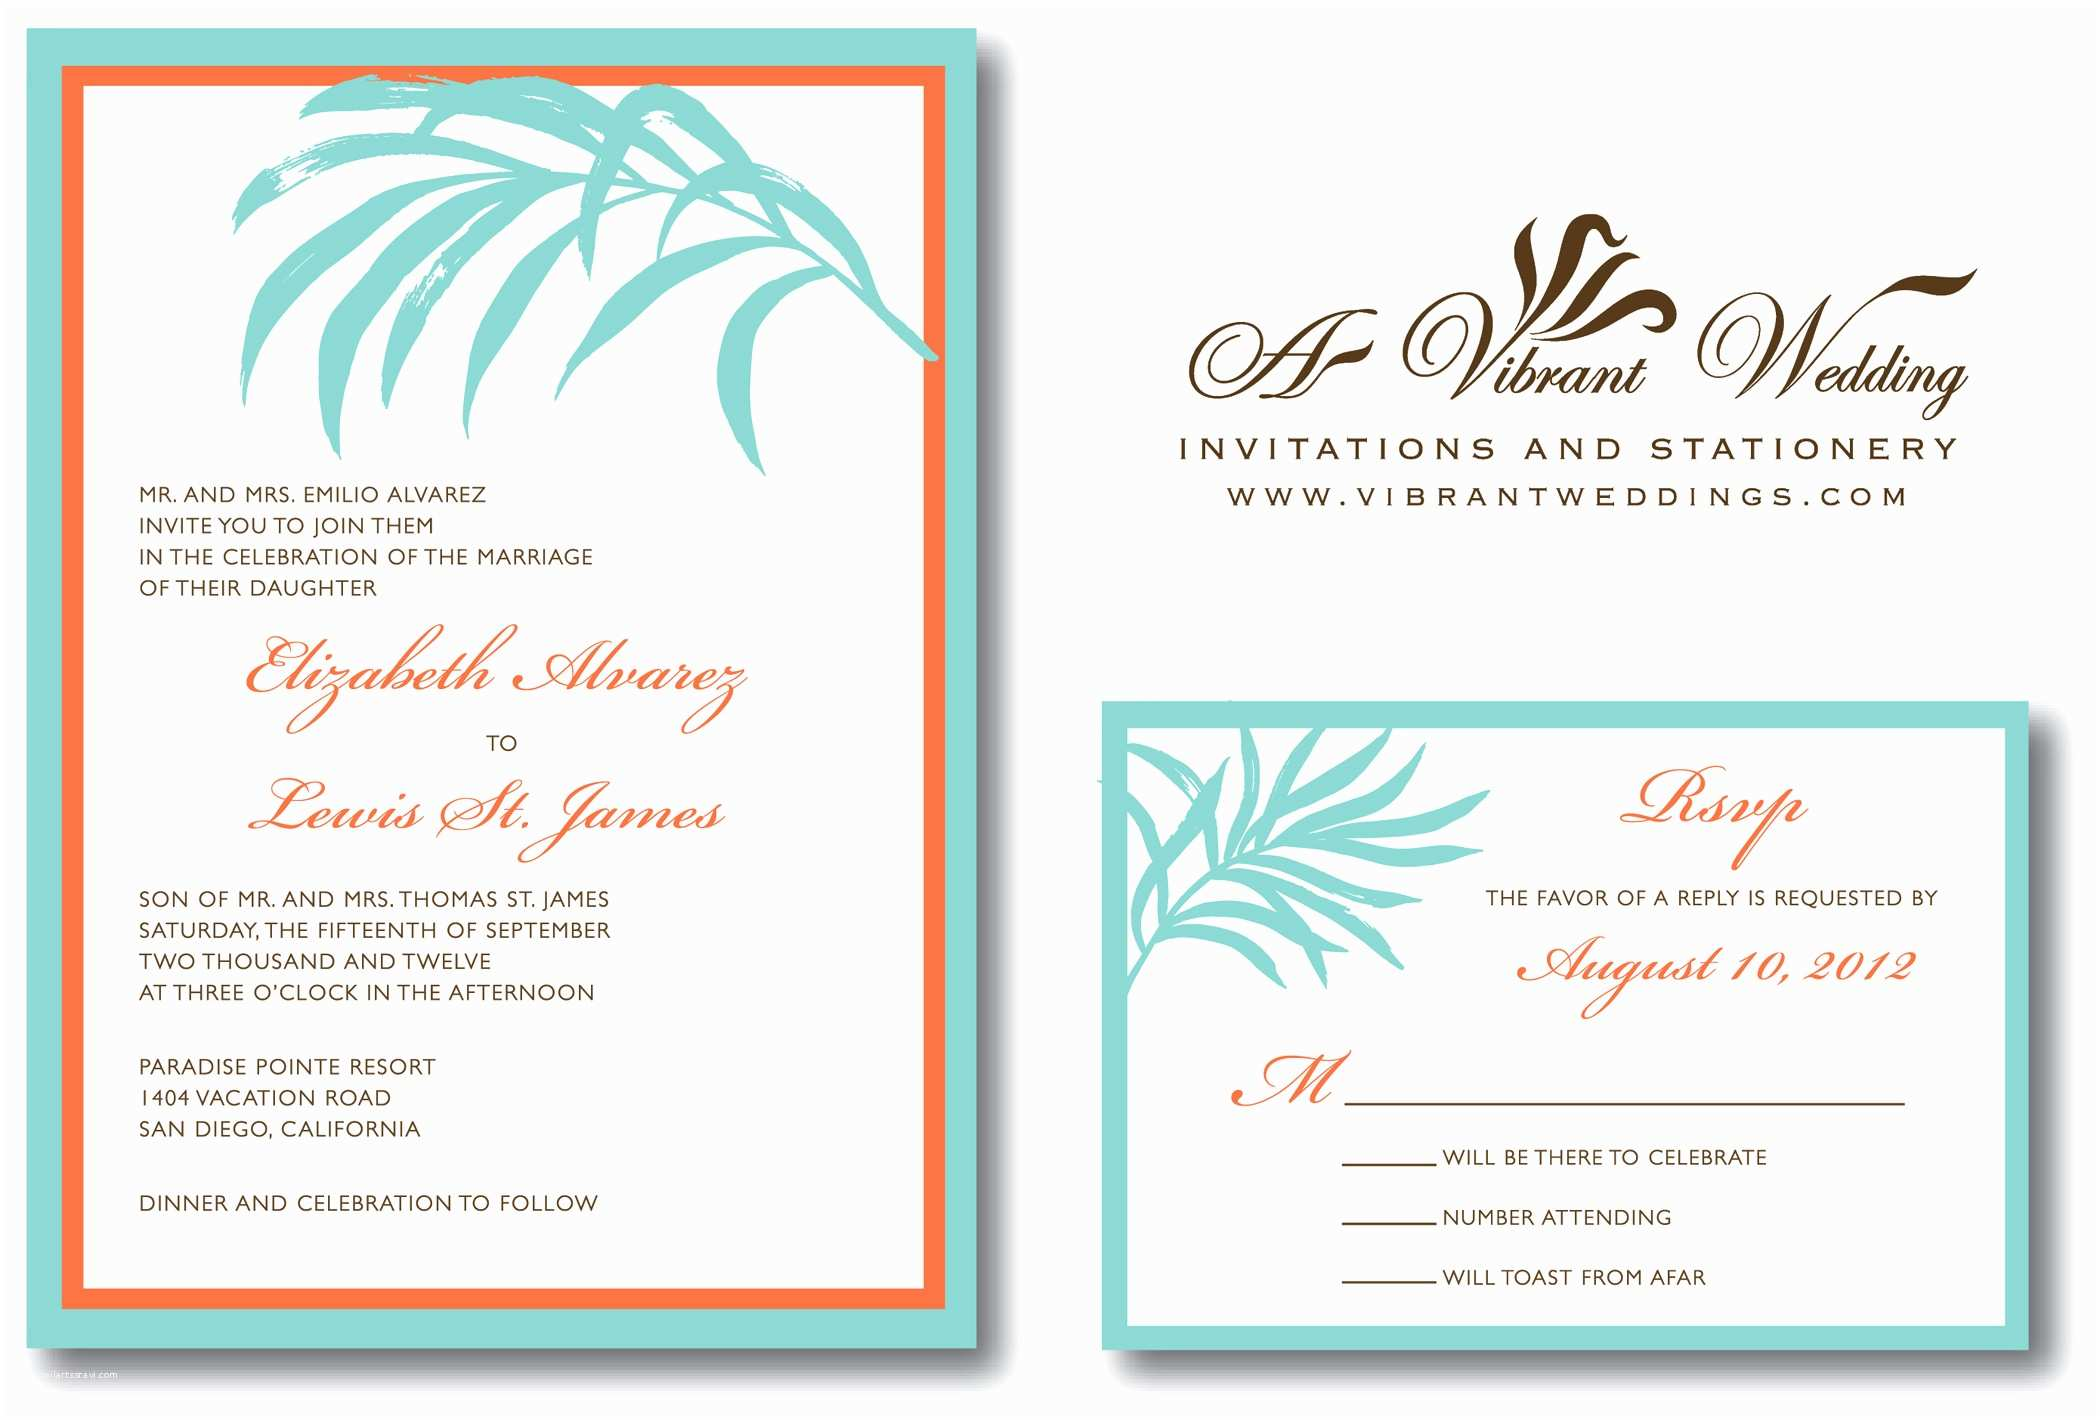 Blue and orange Wedding Invitations Tiffany Blue & orange Wedding Invitation – A Vibrant Wedding